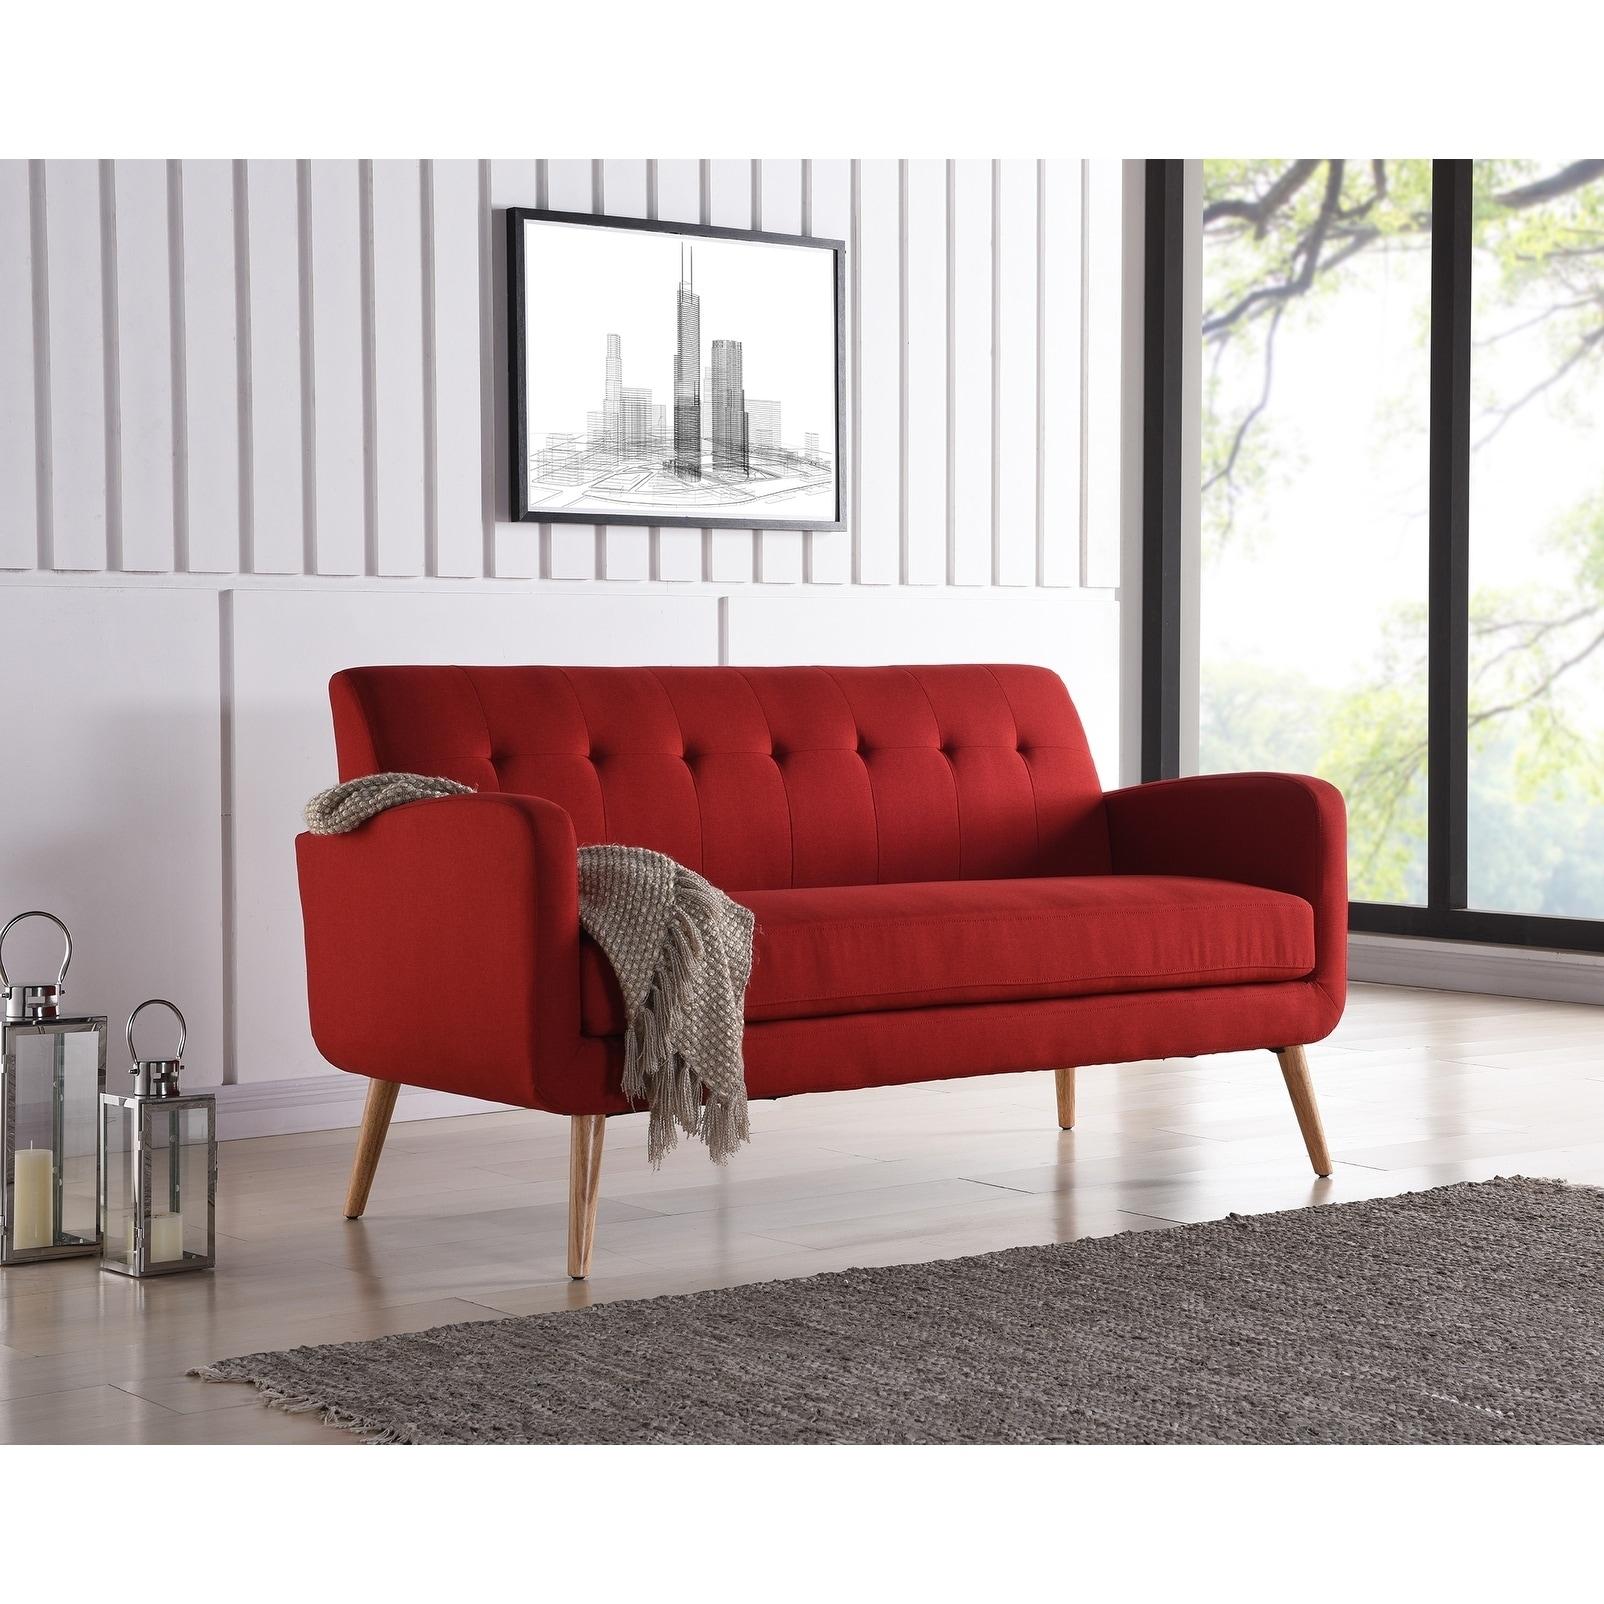 Handy living kingston mid century modern red linen armless sofa